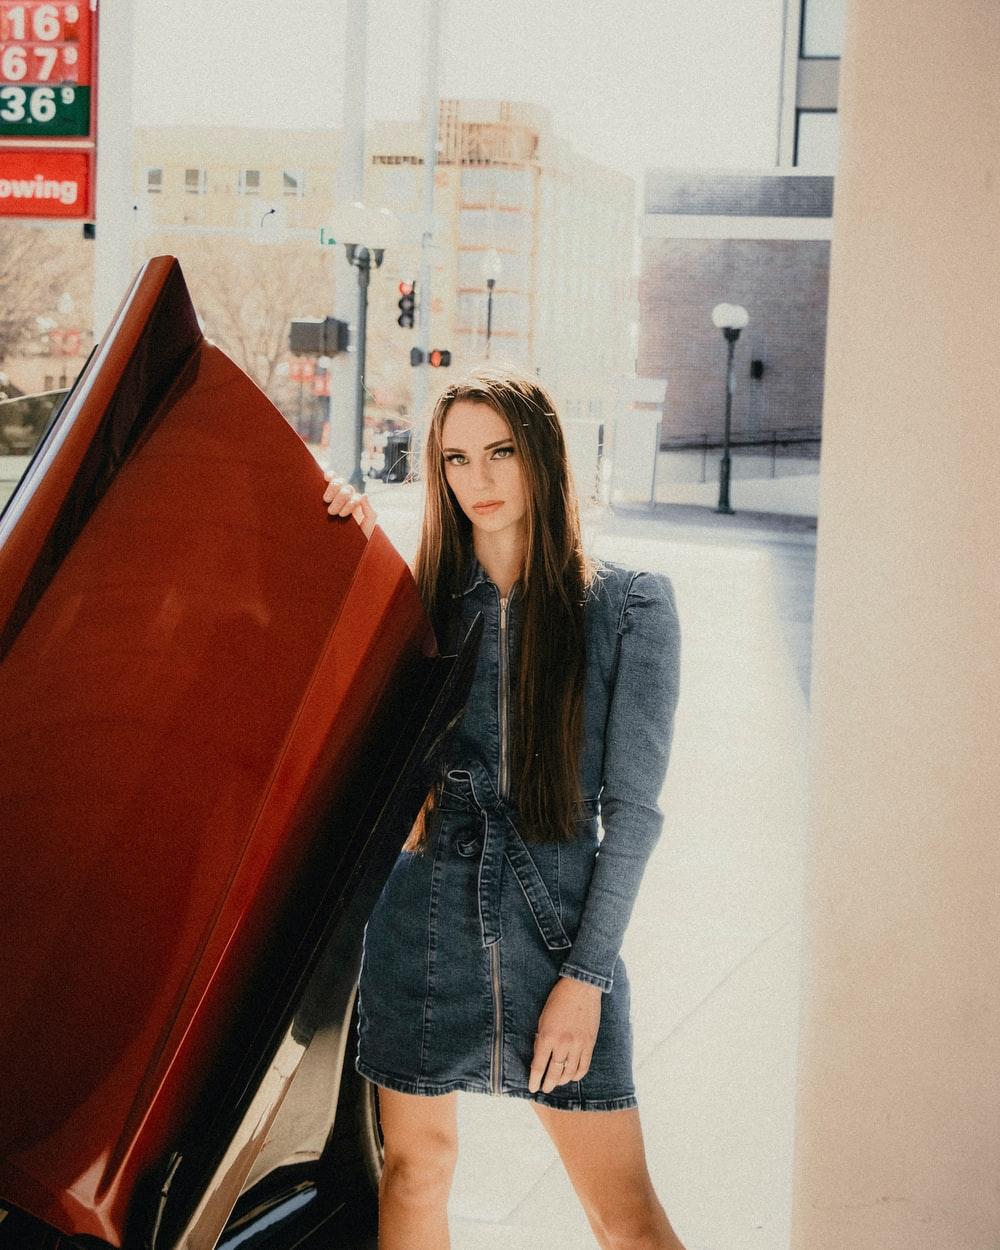 woman in blue denim jacket standing beside red car